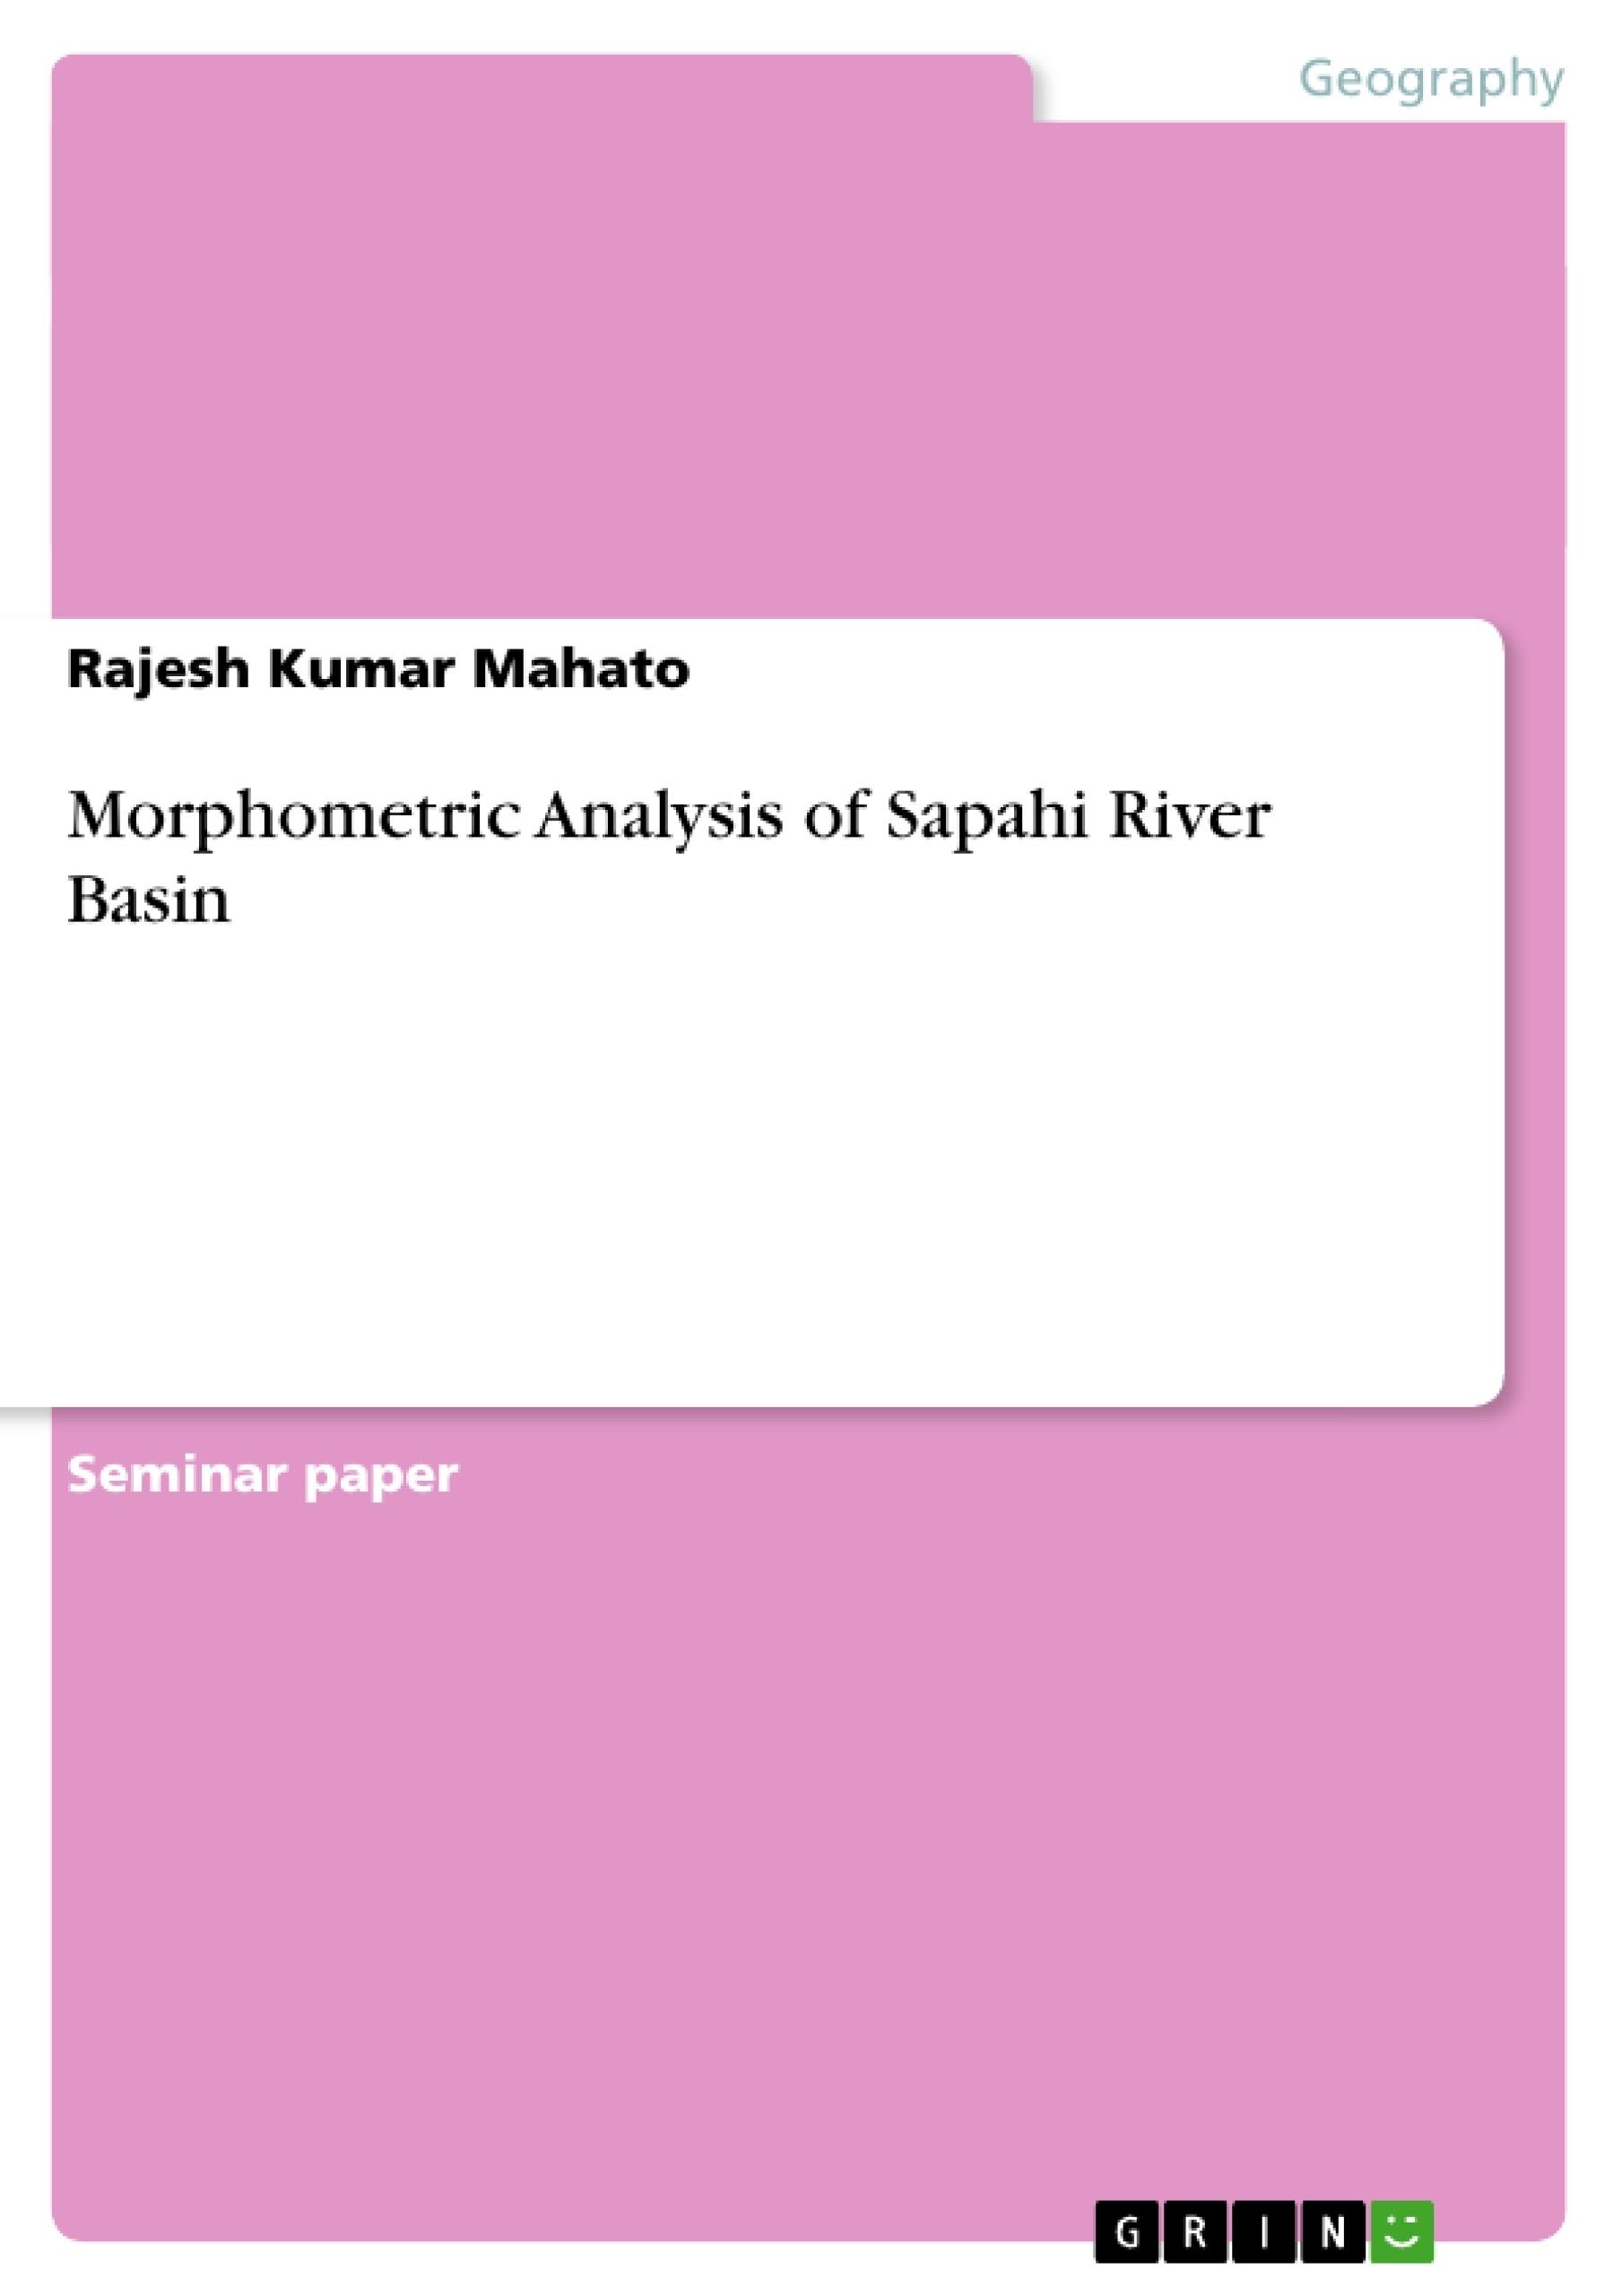 Title: Morphometric Analysis of  Sapahi River Basin